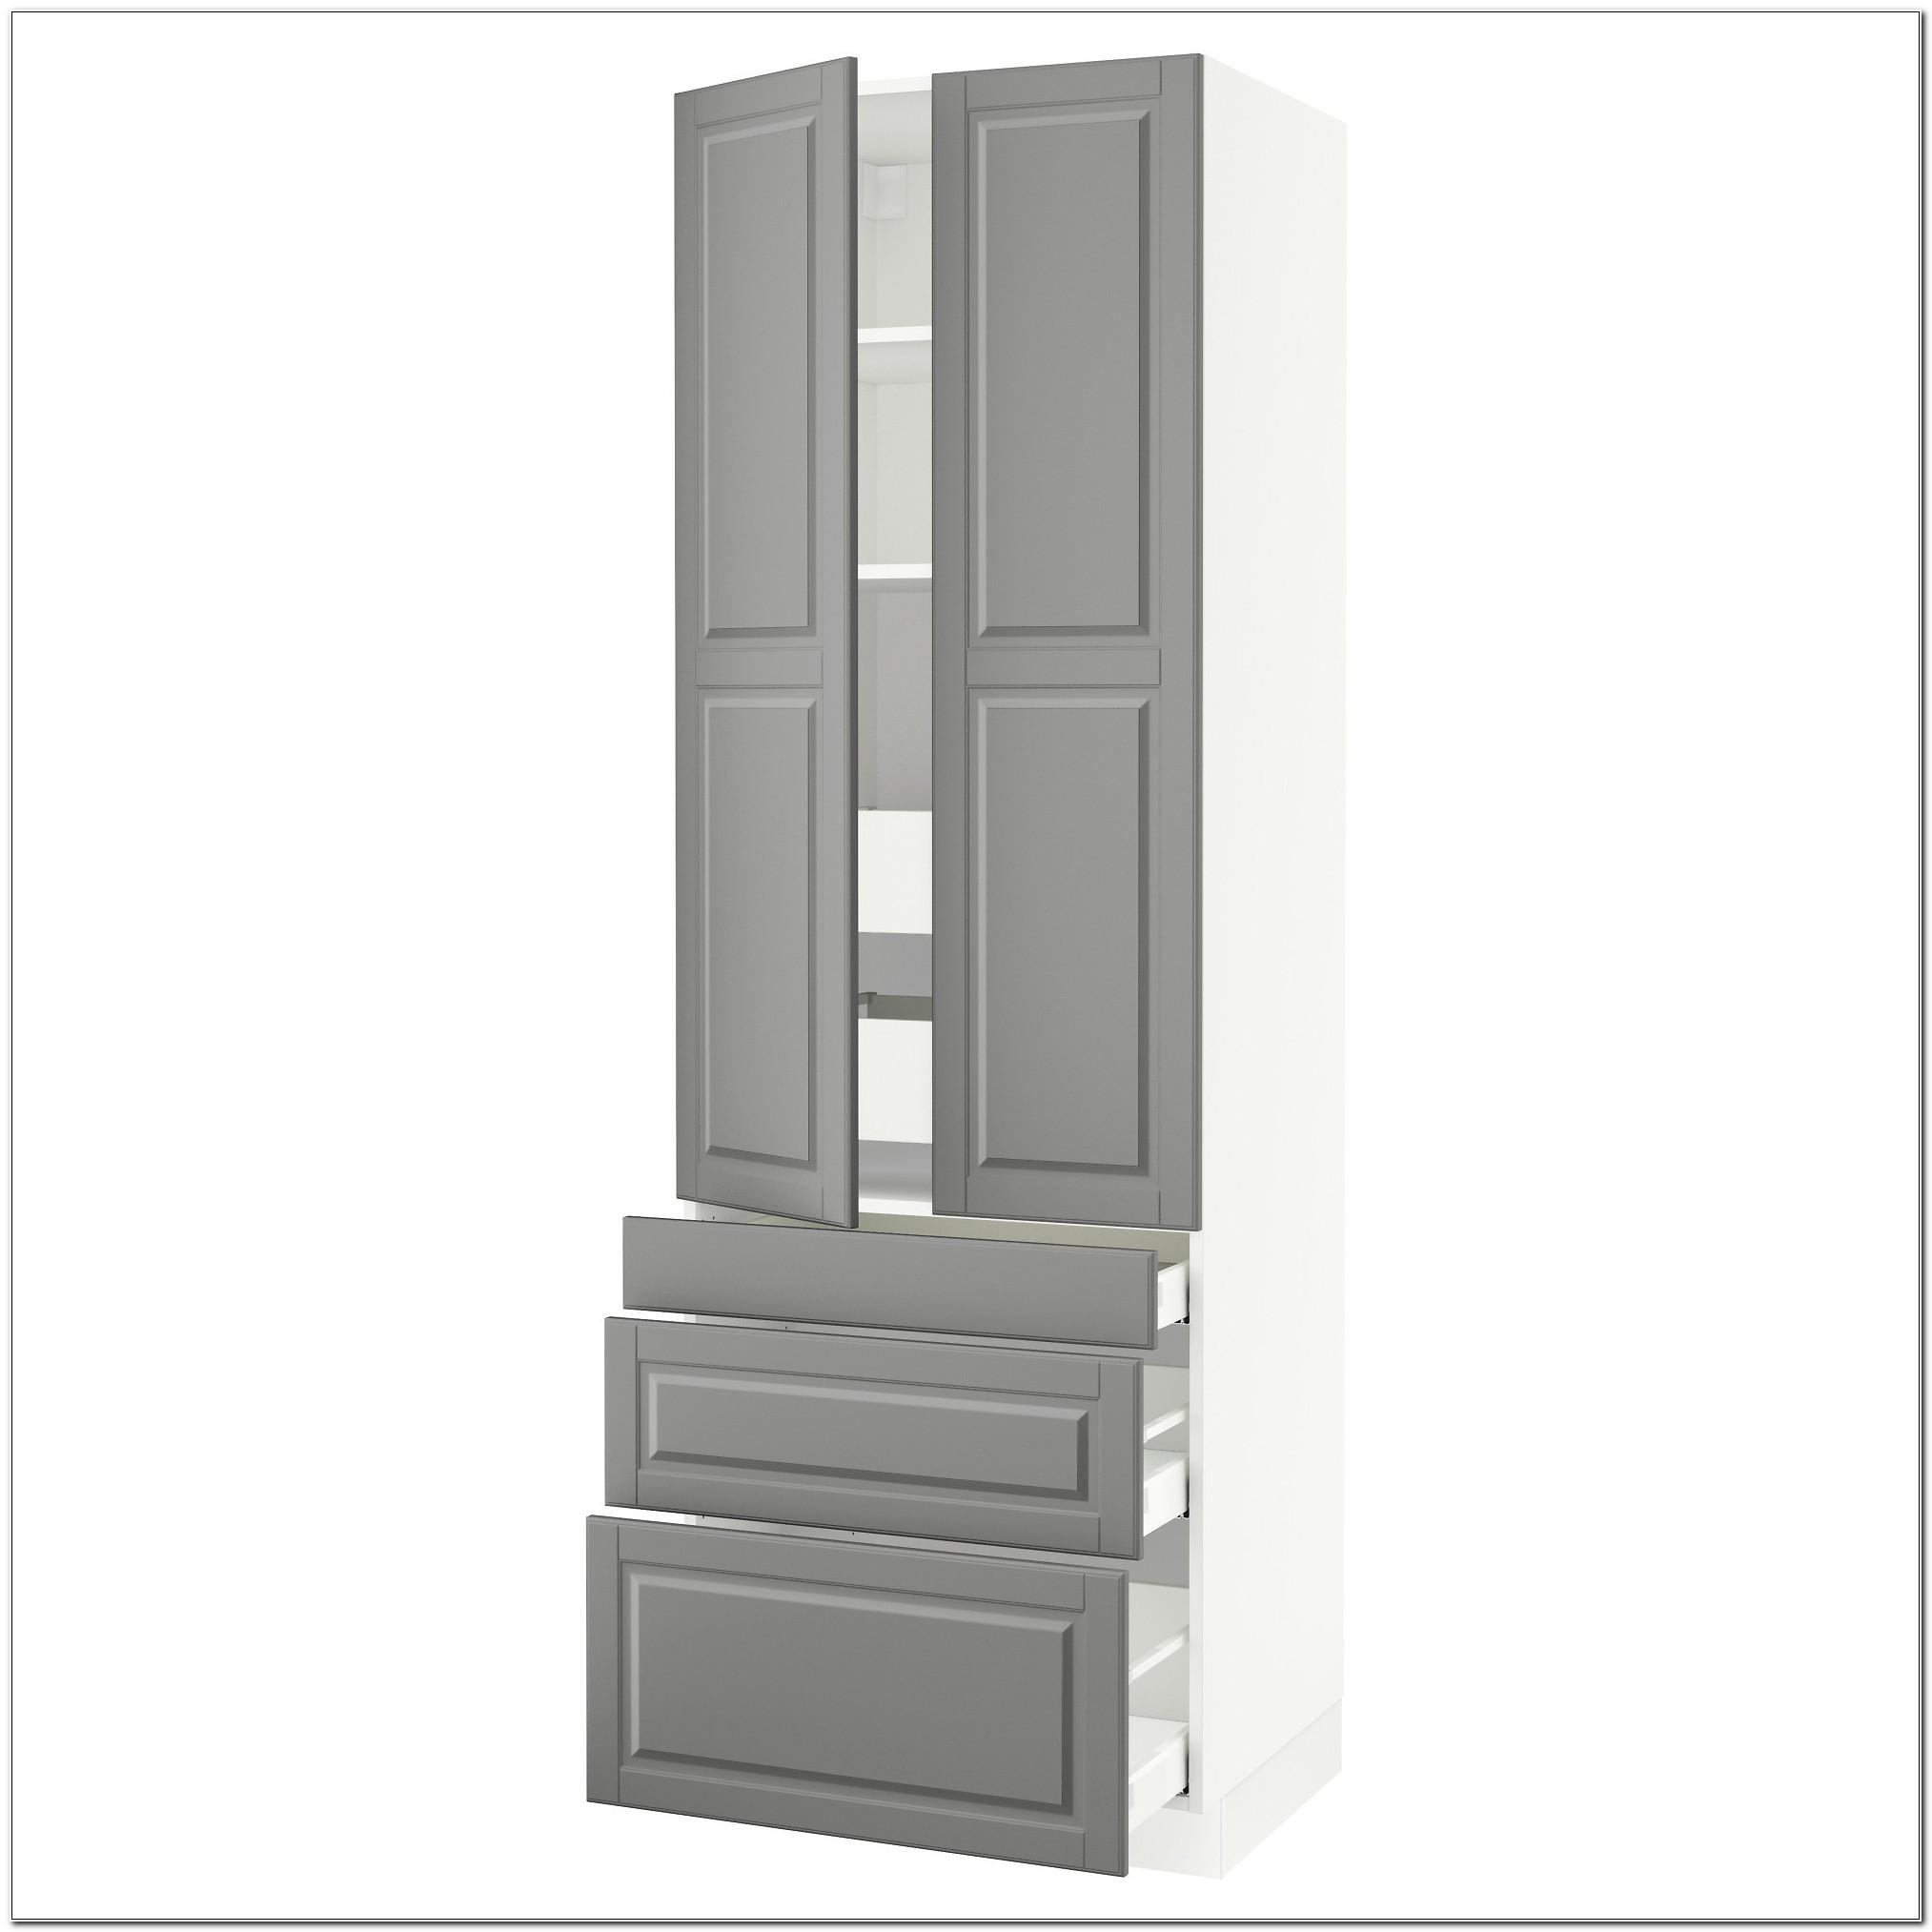 Ikea Tall Kitchen Storage Cabinet